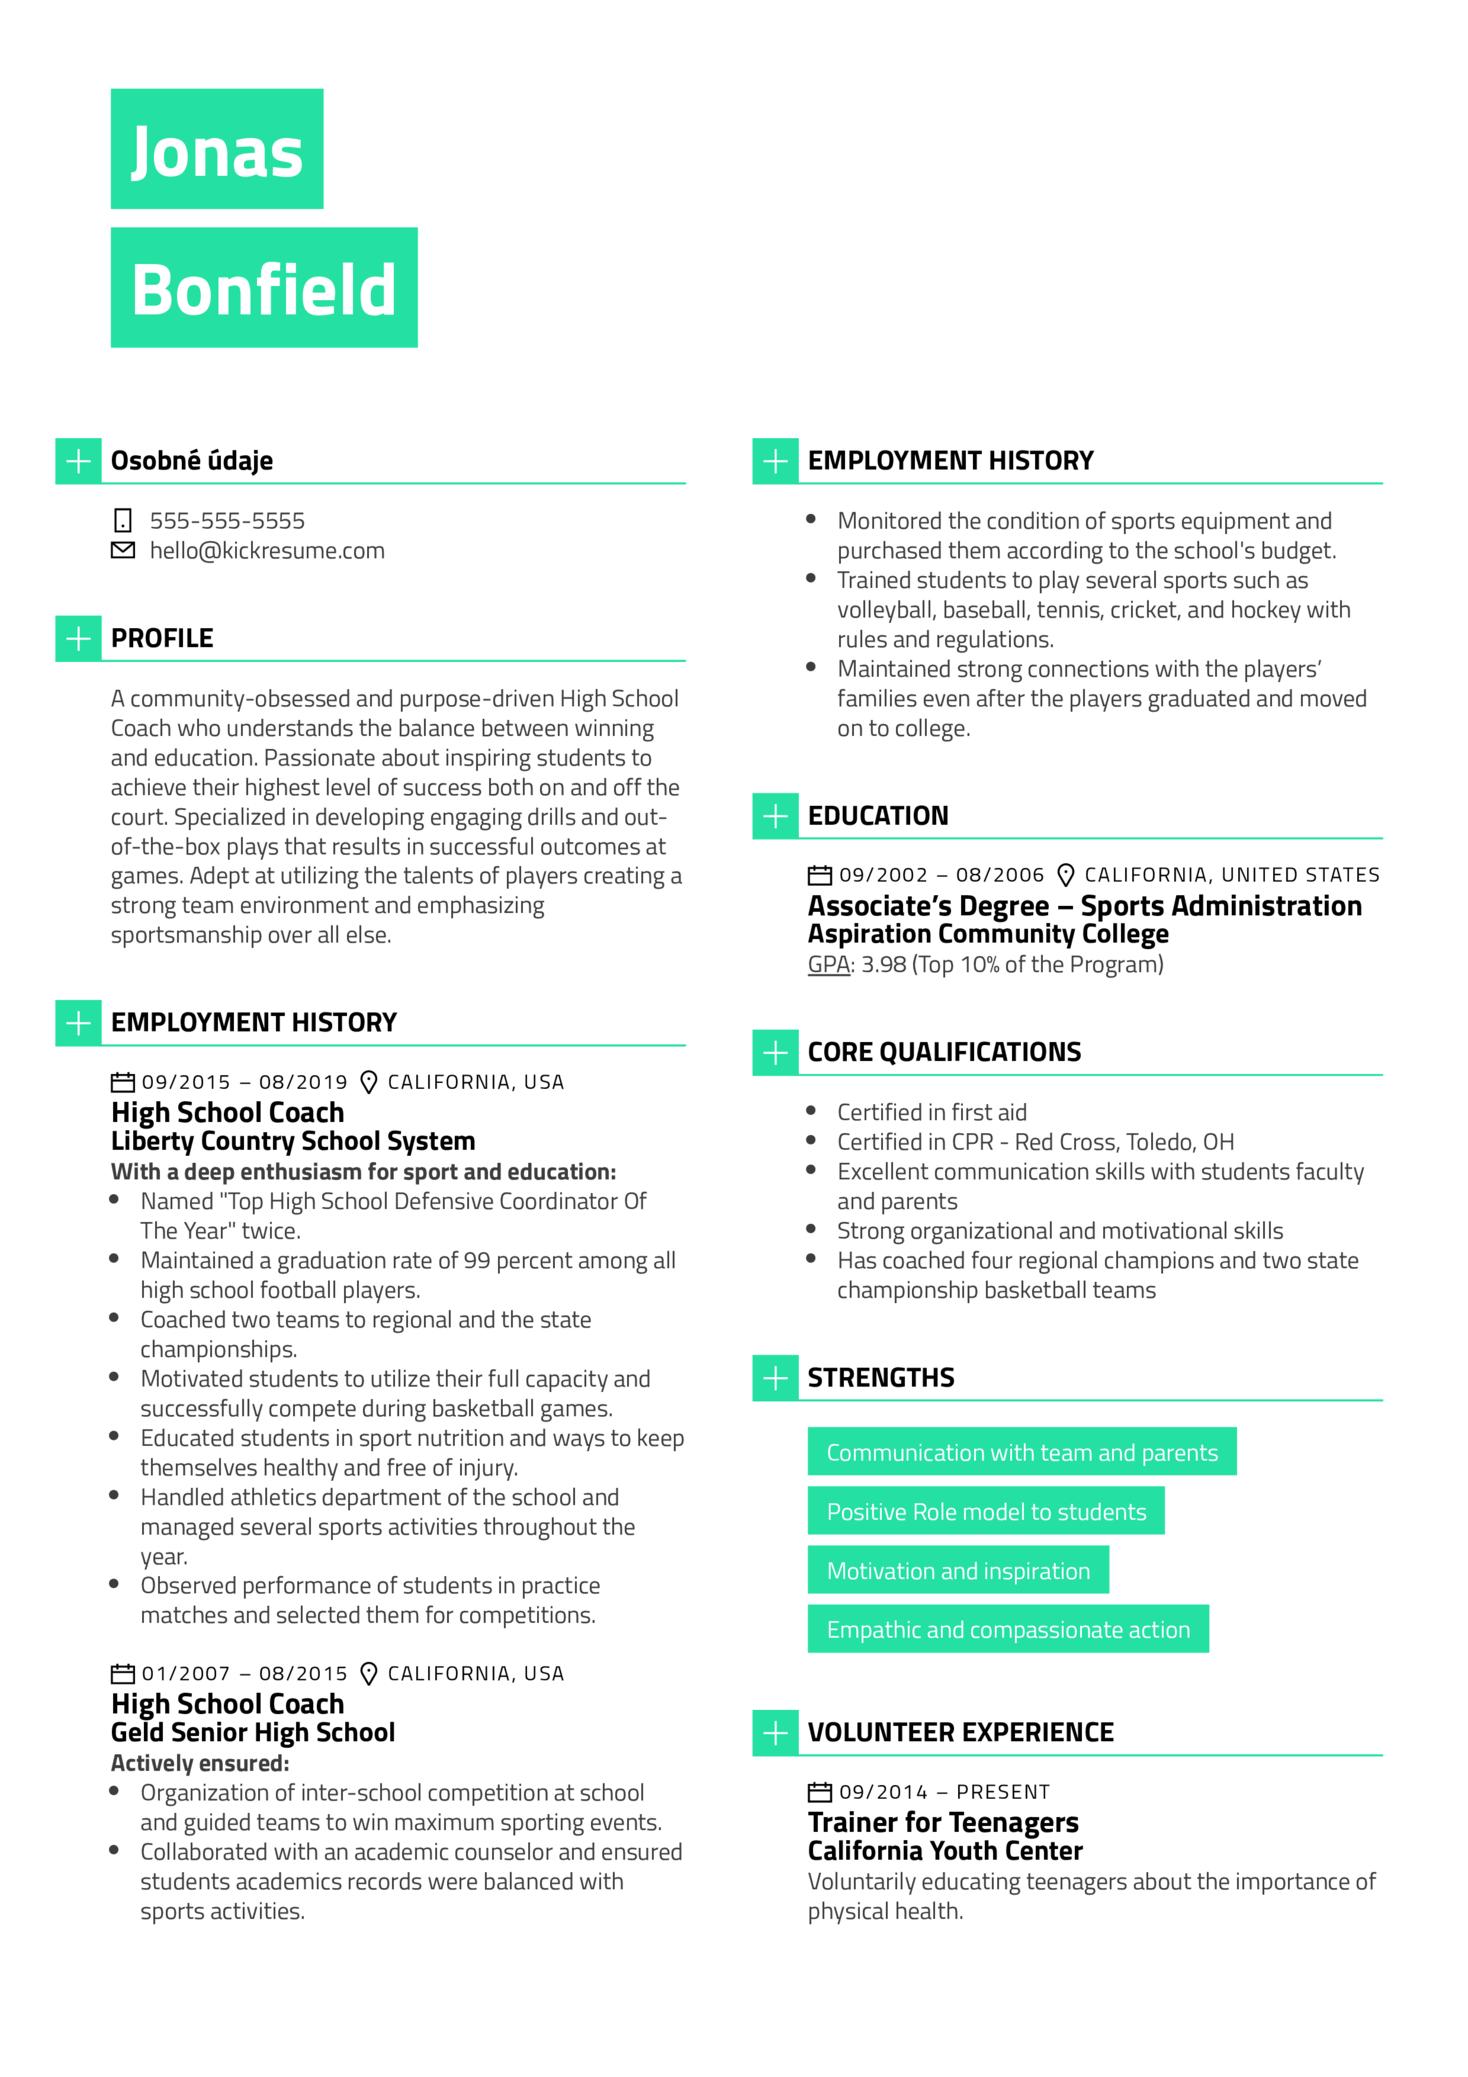 High School Coach Resume Example (Parte 1)